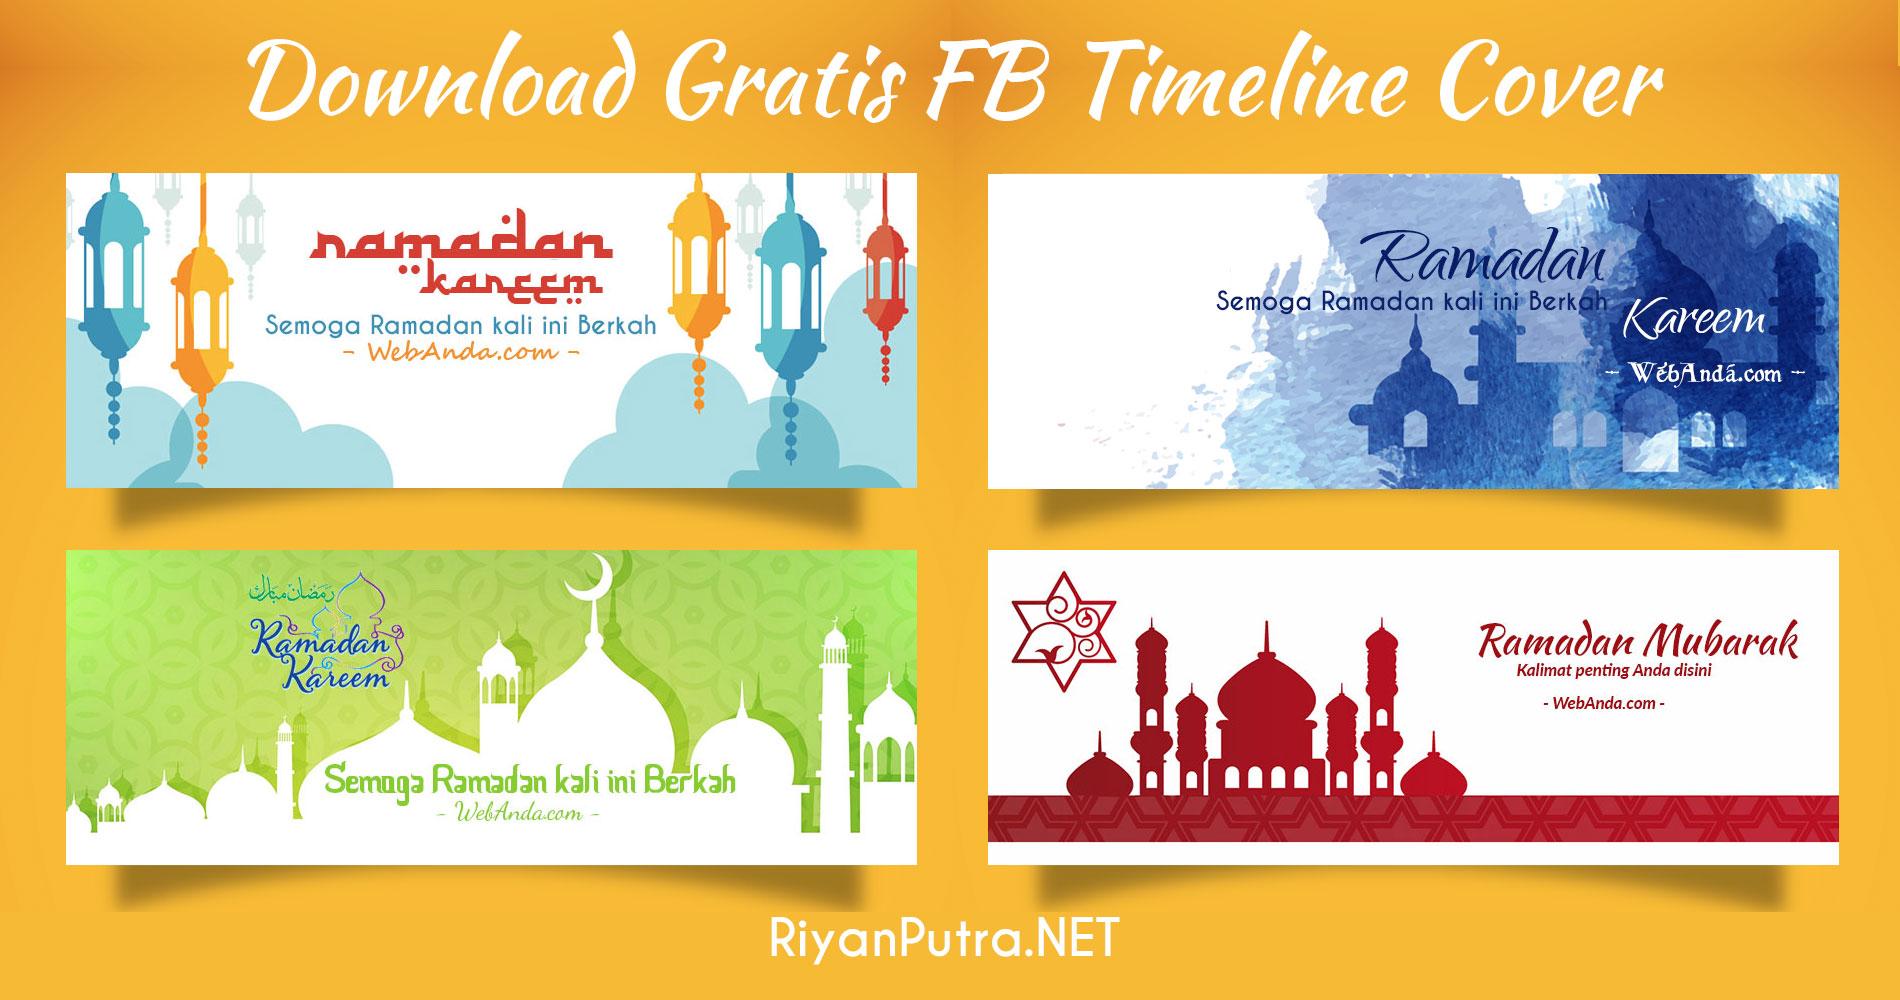 fb-timeline-cover-ramadan